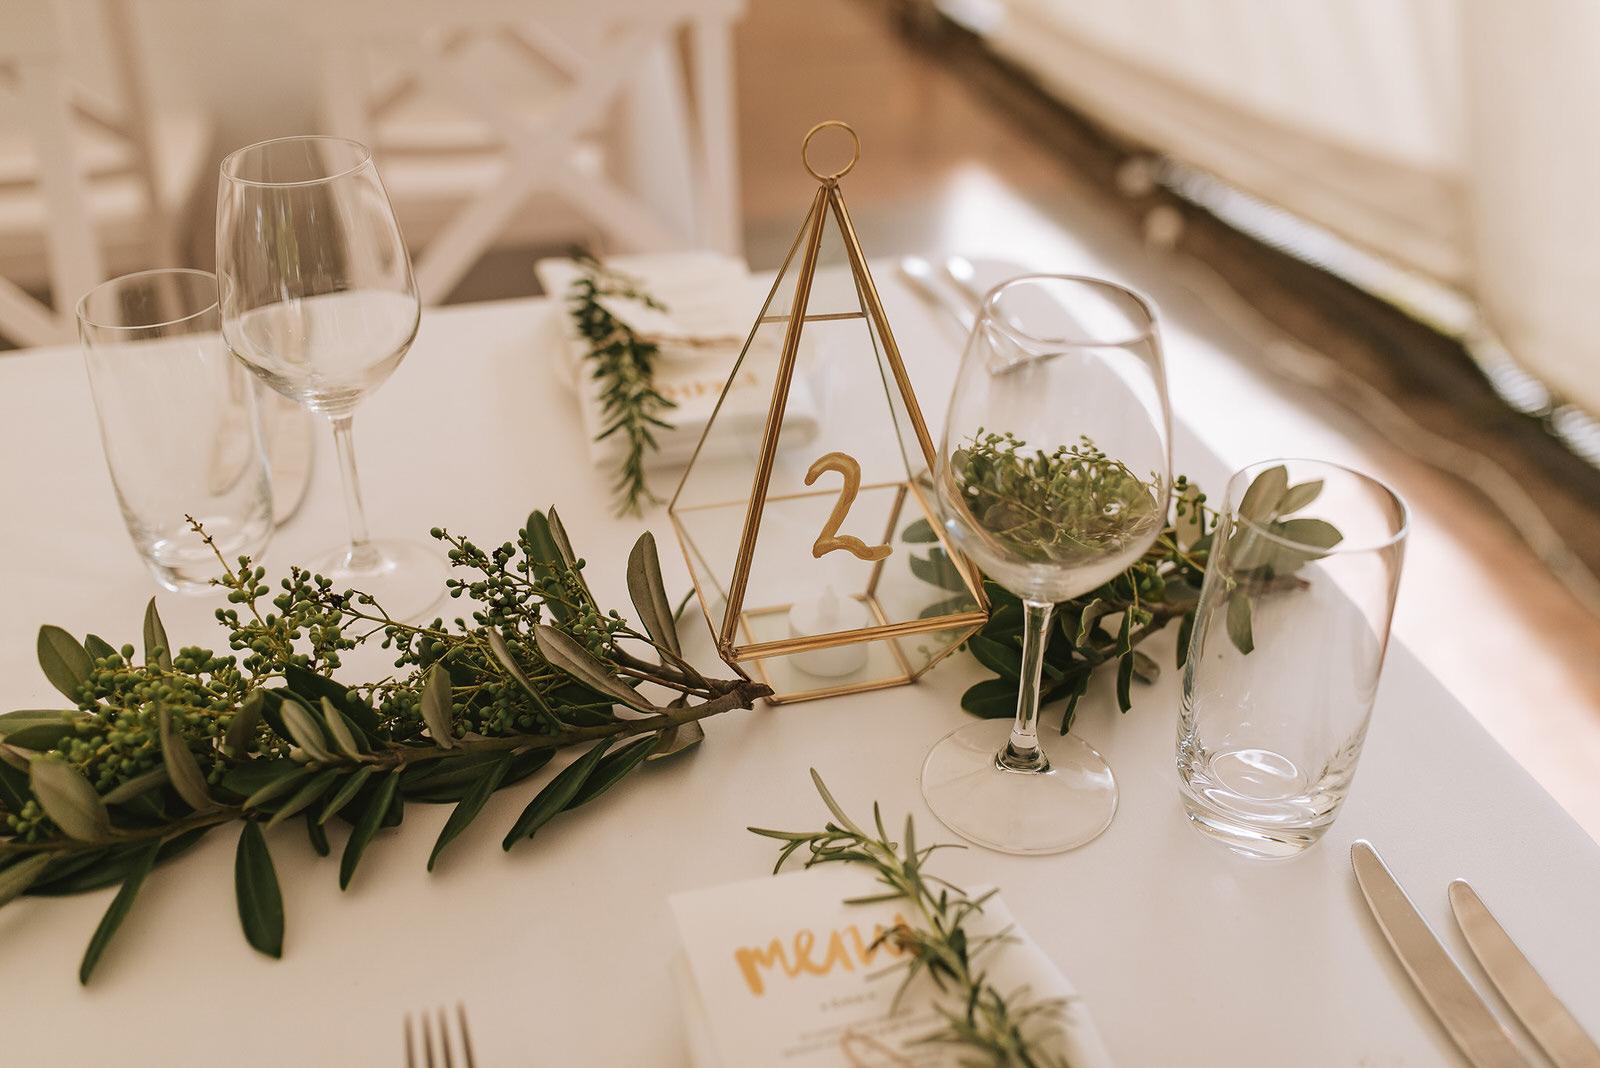 newfound-r-s-ataahua-garden-venue-tauranga-wedding-046